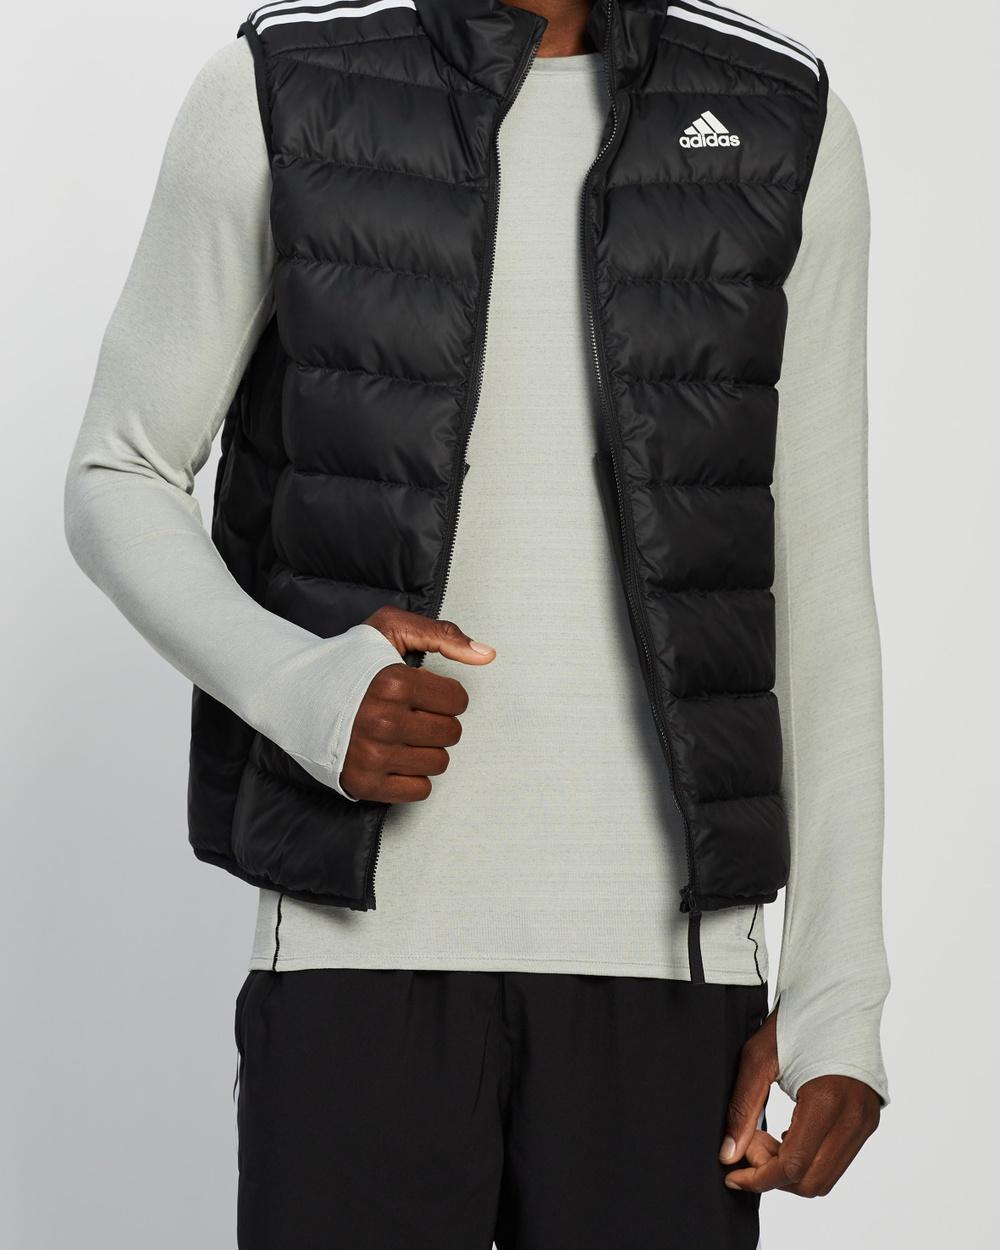 adidas Performance Essentials Down Vest Coats & Jackets Black